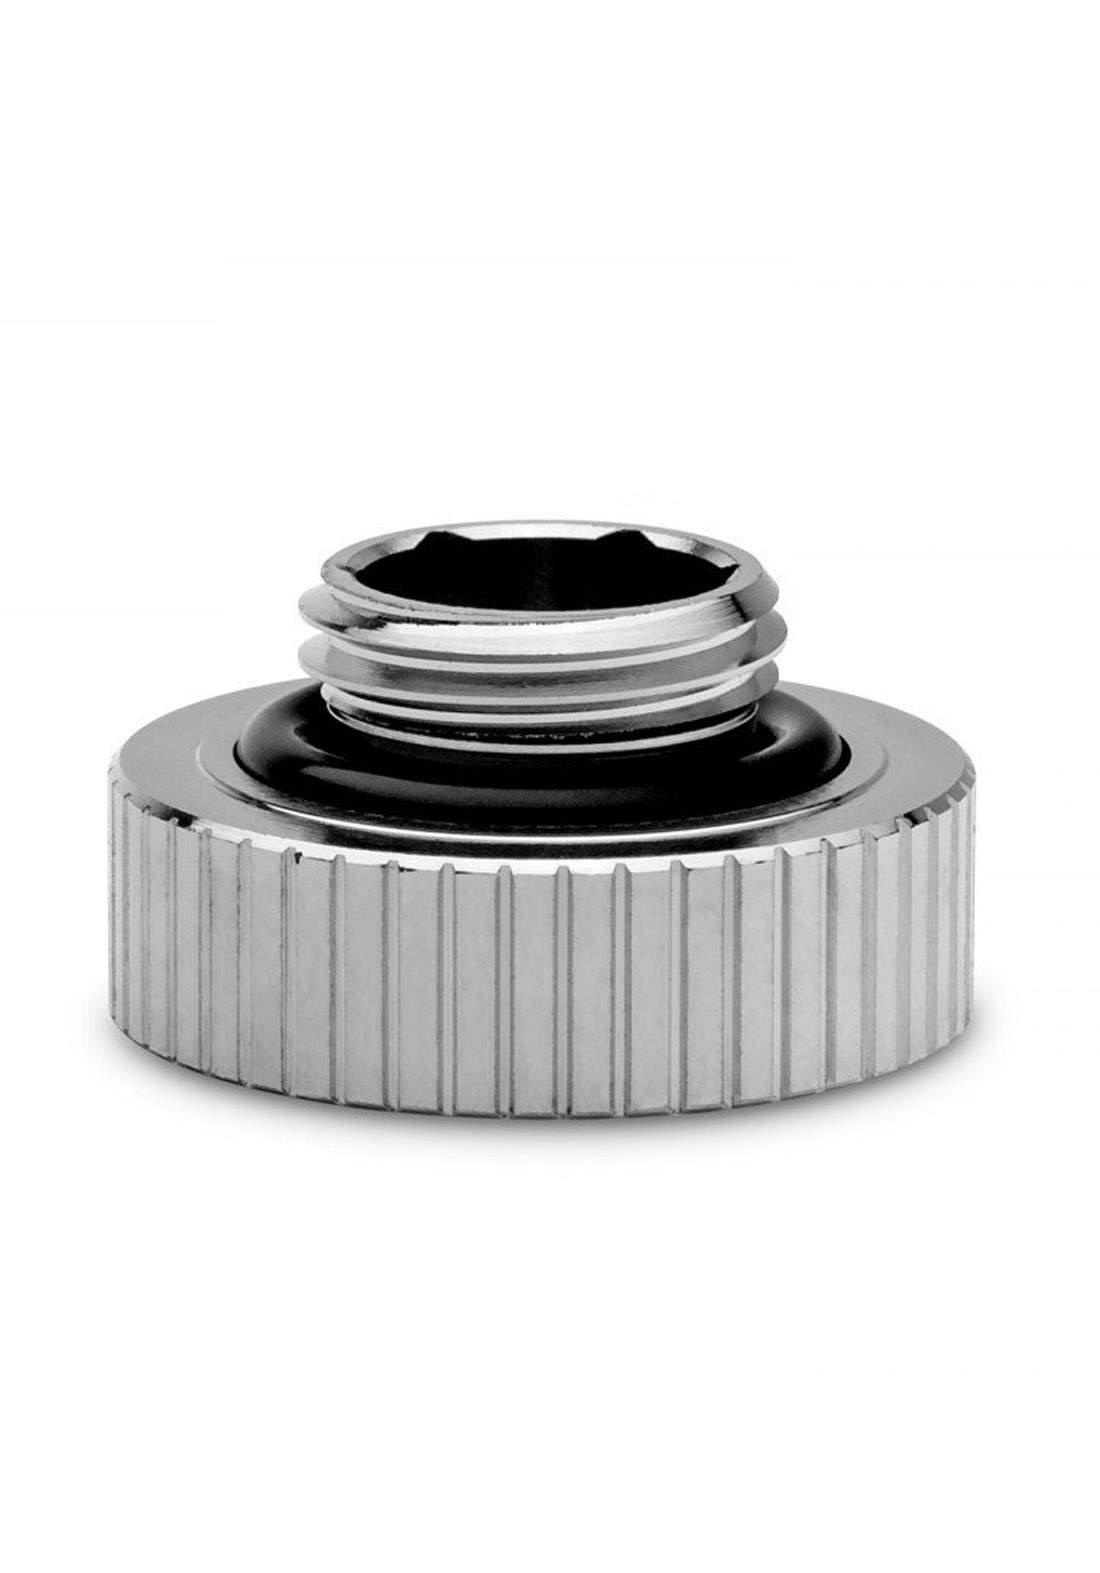 EK-Quantum Torque Extender Static MF 7 - Nickel